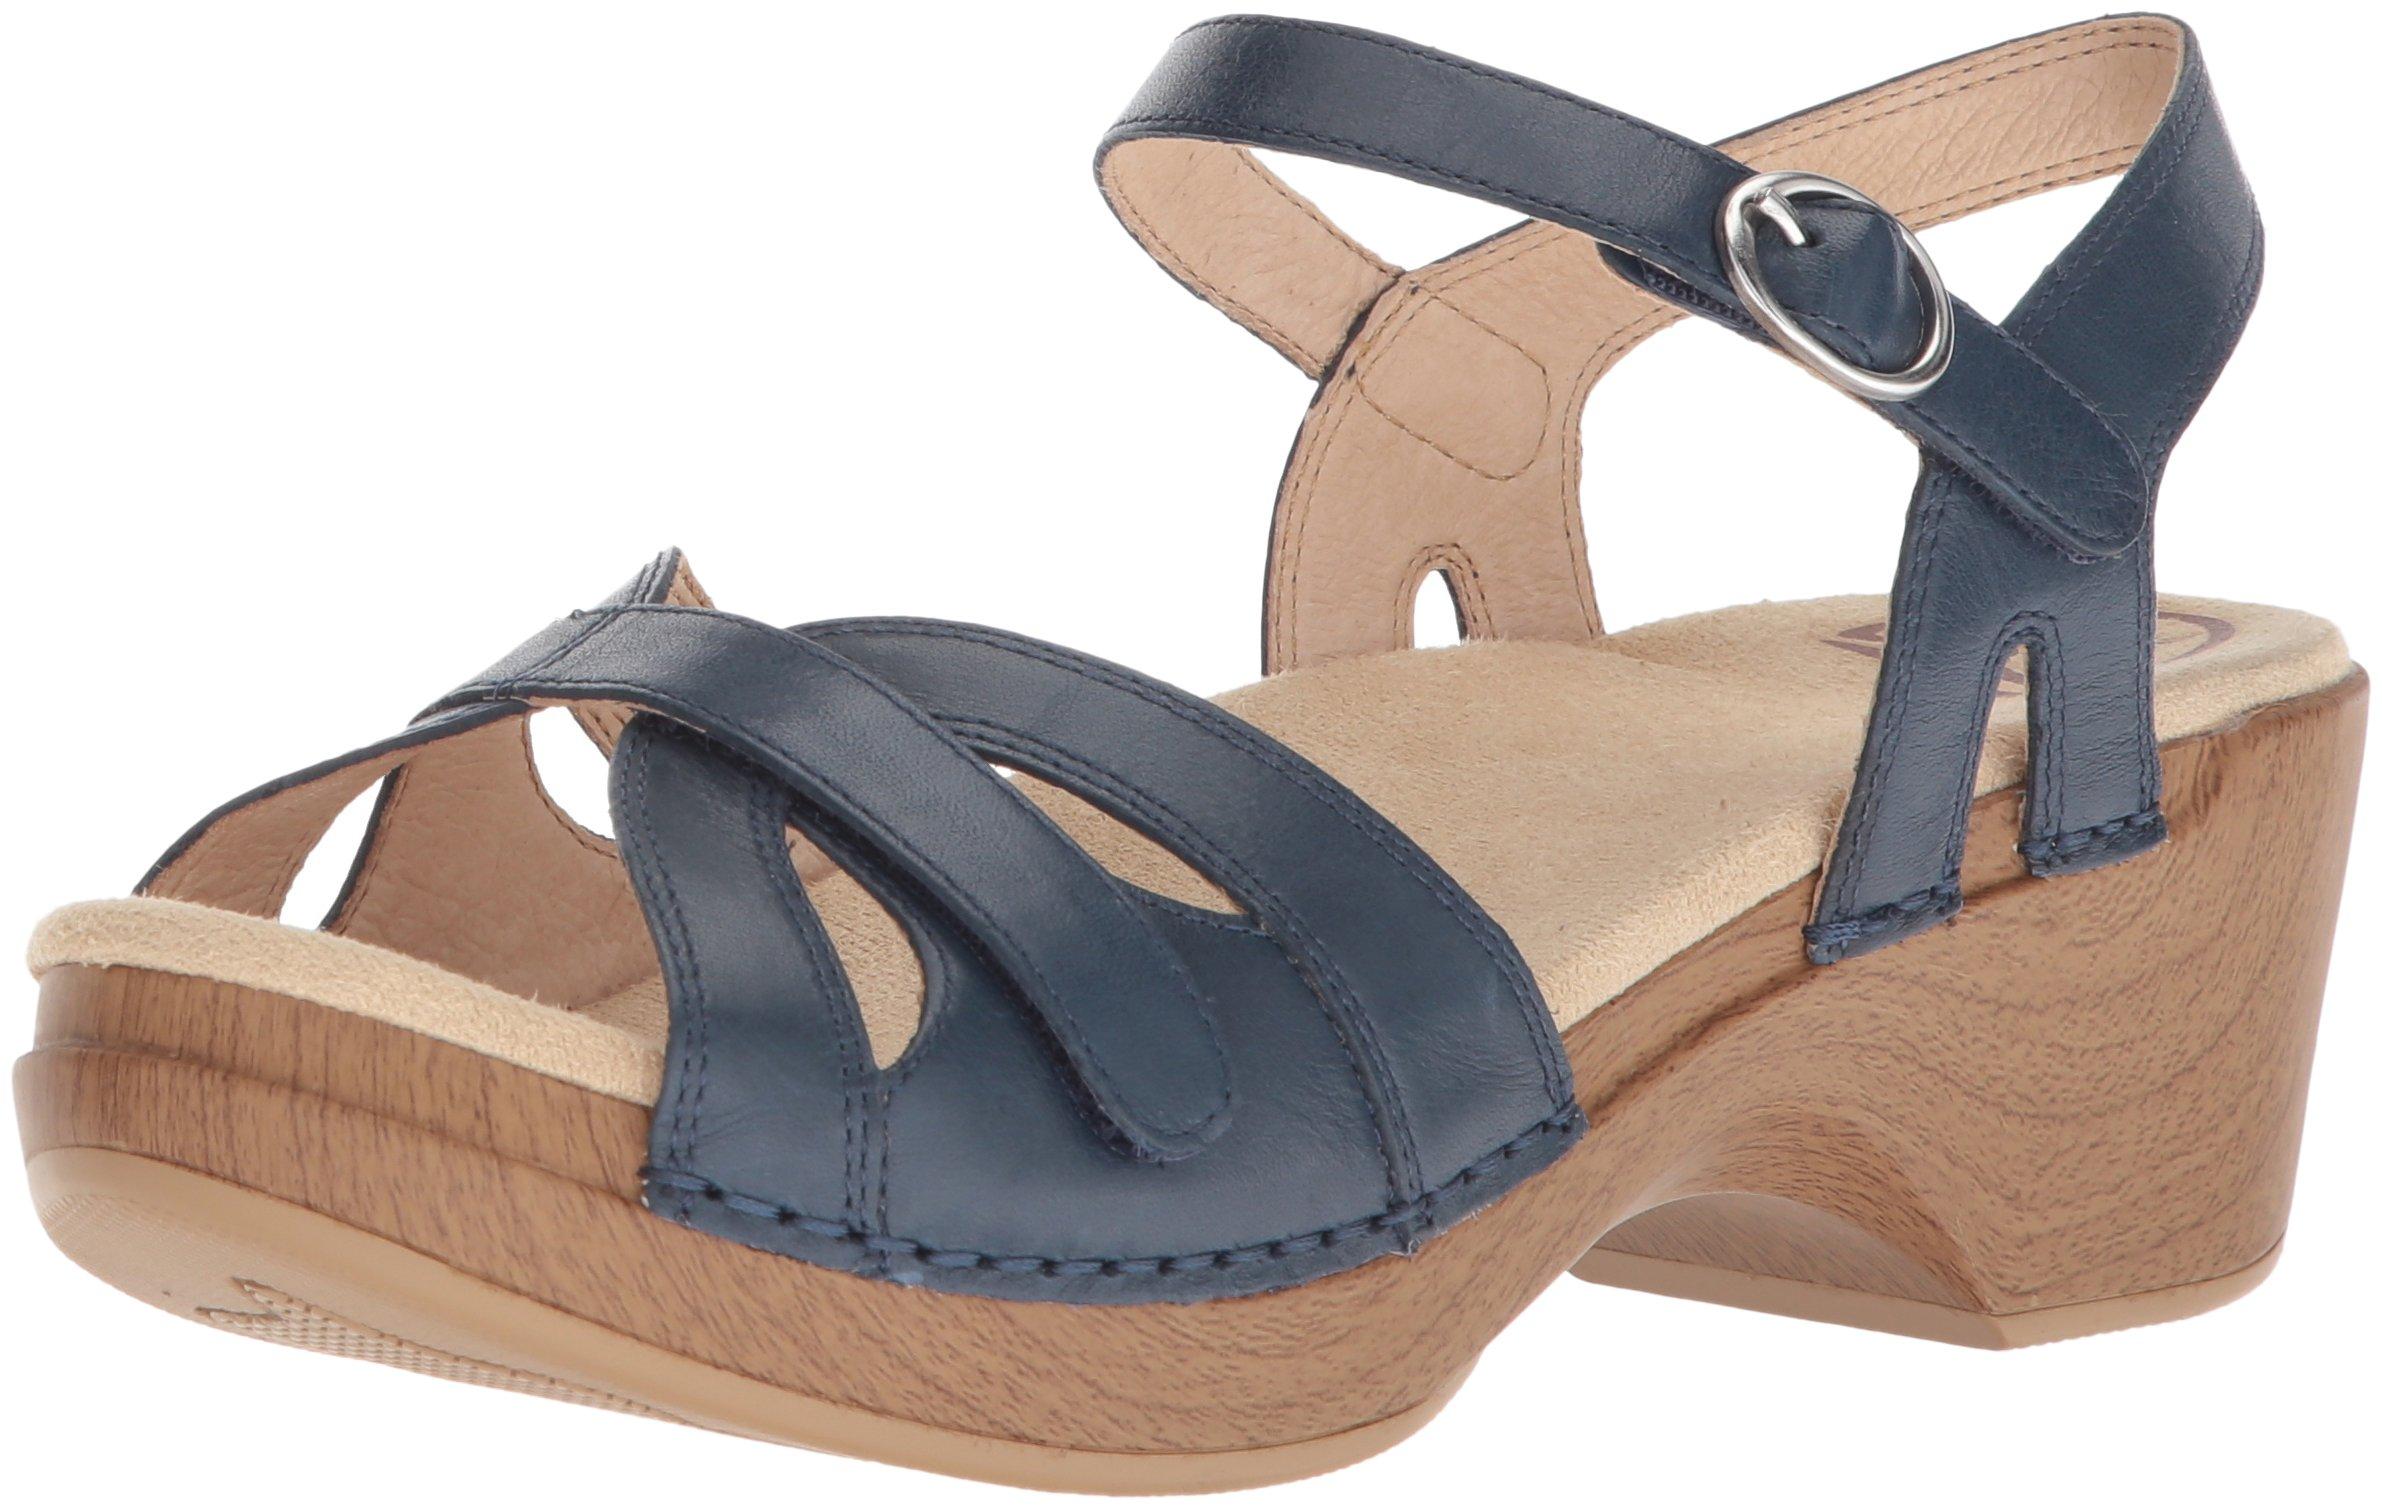 Dansko Women's Season Flat Sandal, Denim Full Grain, 39 M EU (8.5-9 US)